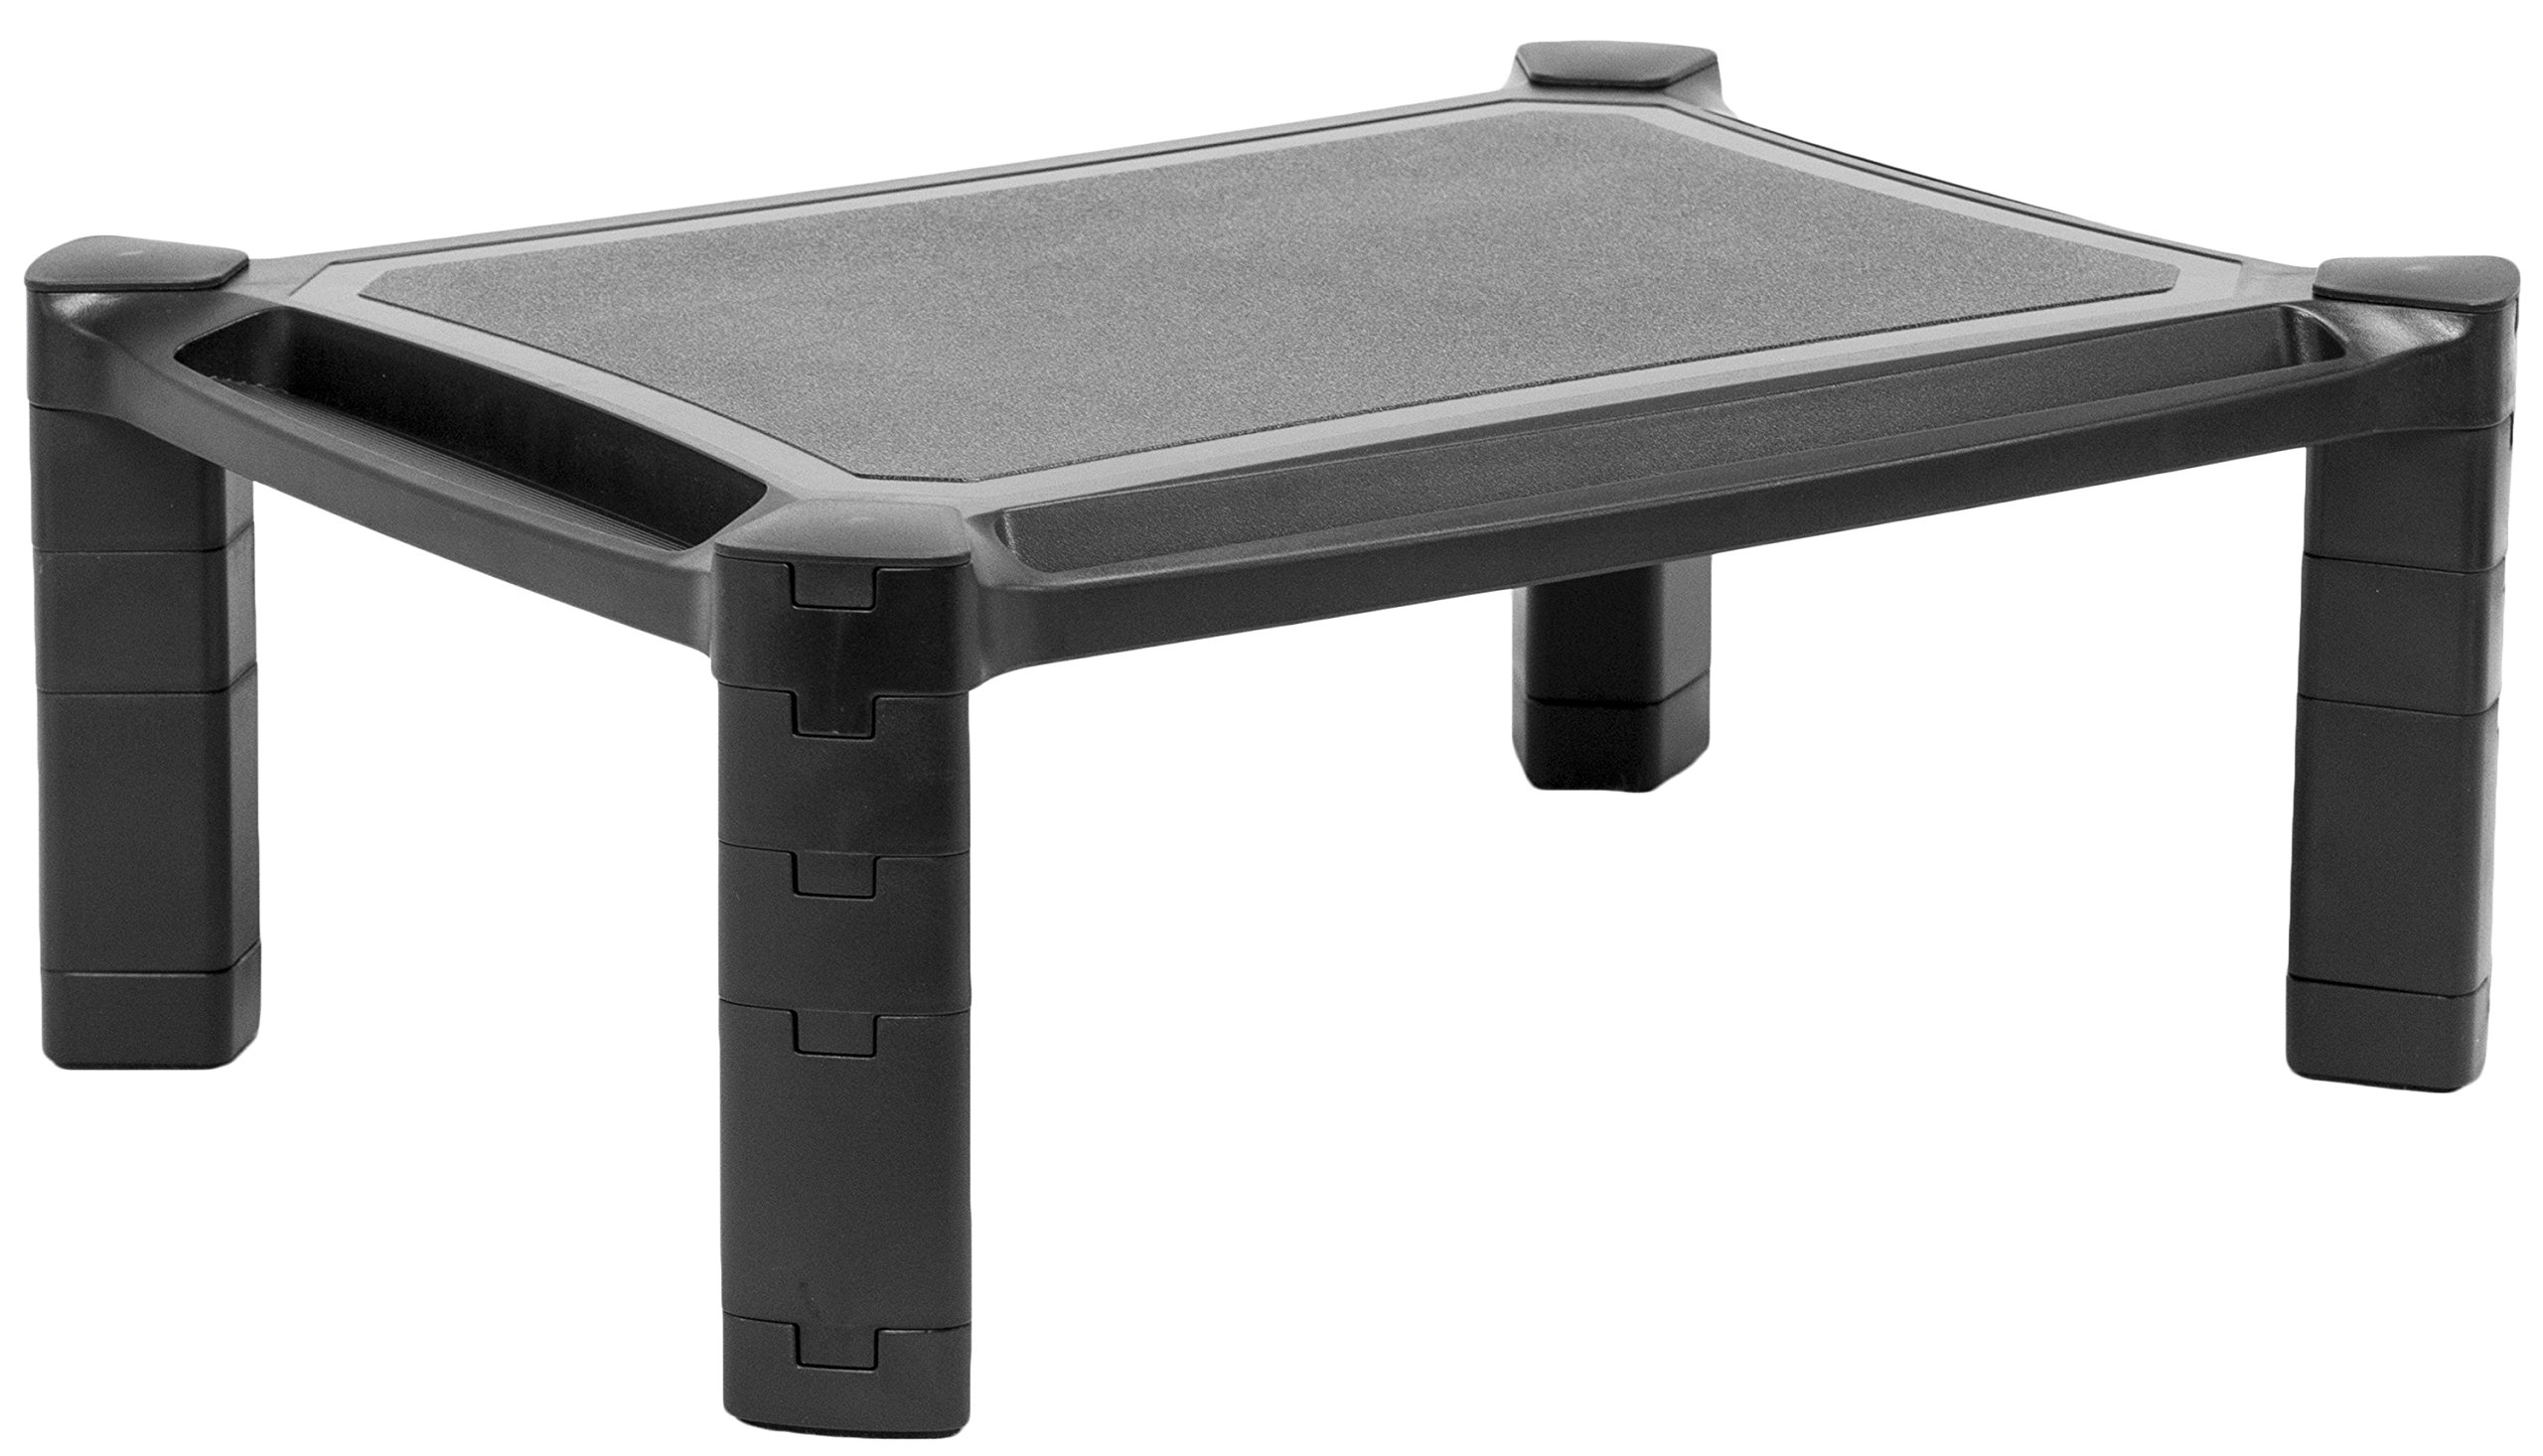 VIVO Height Adjustable Computer Monitor Stacked Desk Riser Tabletop Smart Stand Platform Holds Screens, Phones, Pens, Calculators, and More (STAND-V000B)